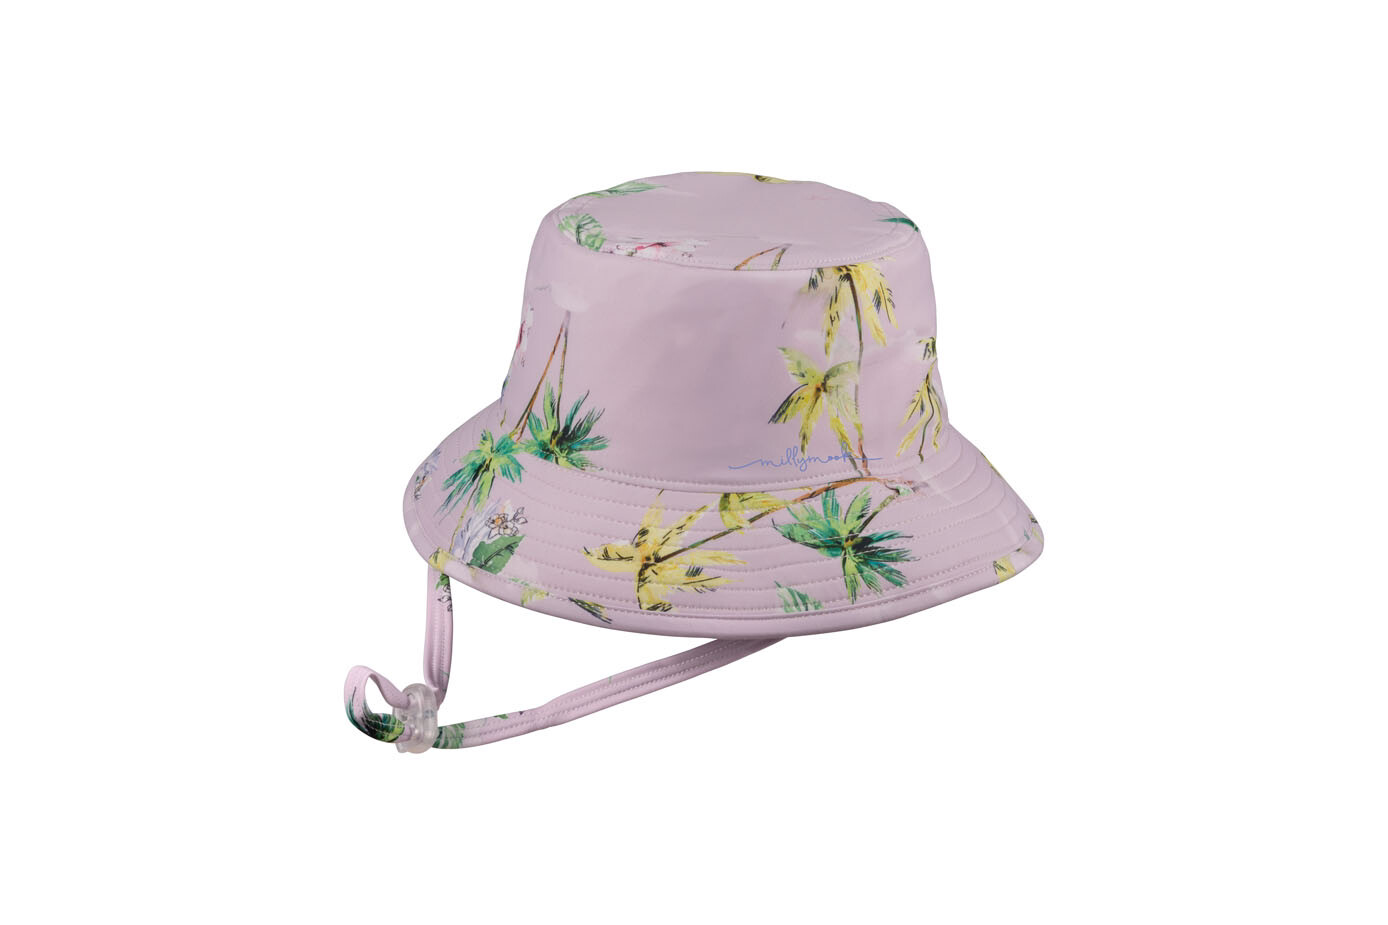 Purple Baby Girls Bucket Hat Pia - Reversible 12-24 Months HBX-0088